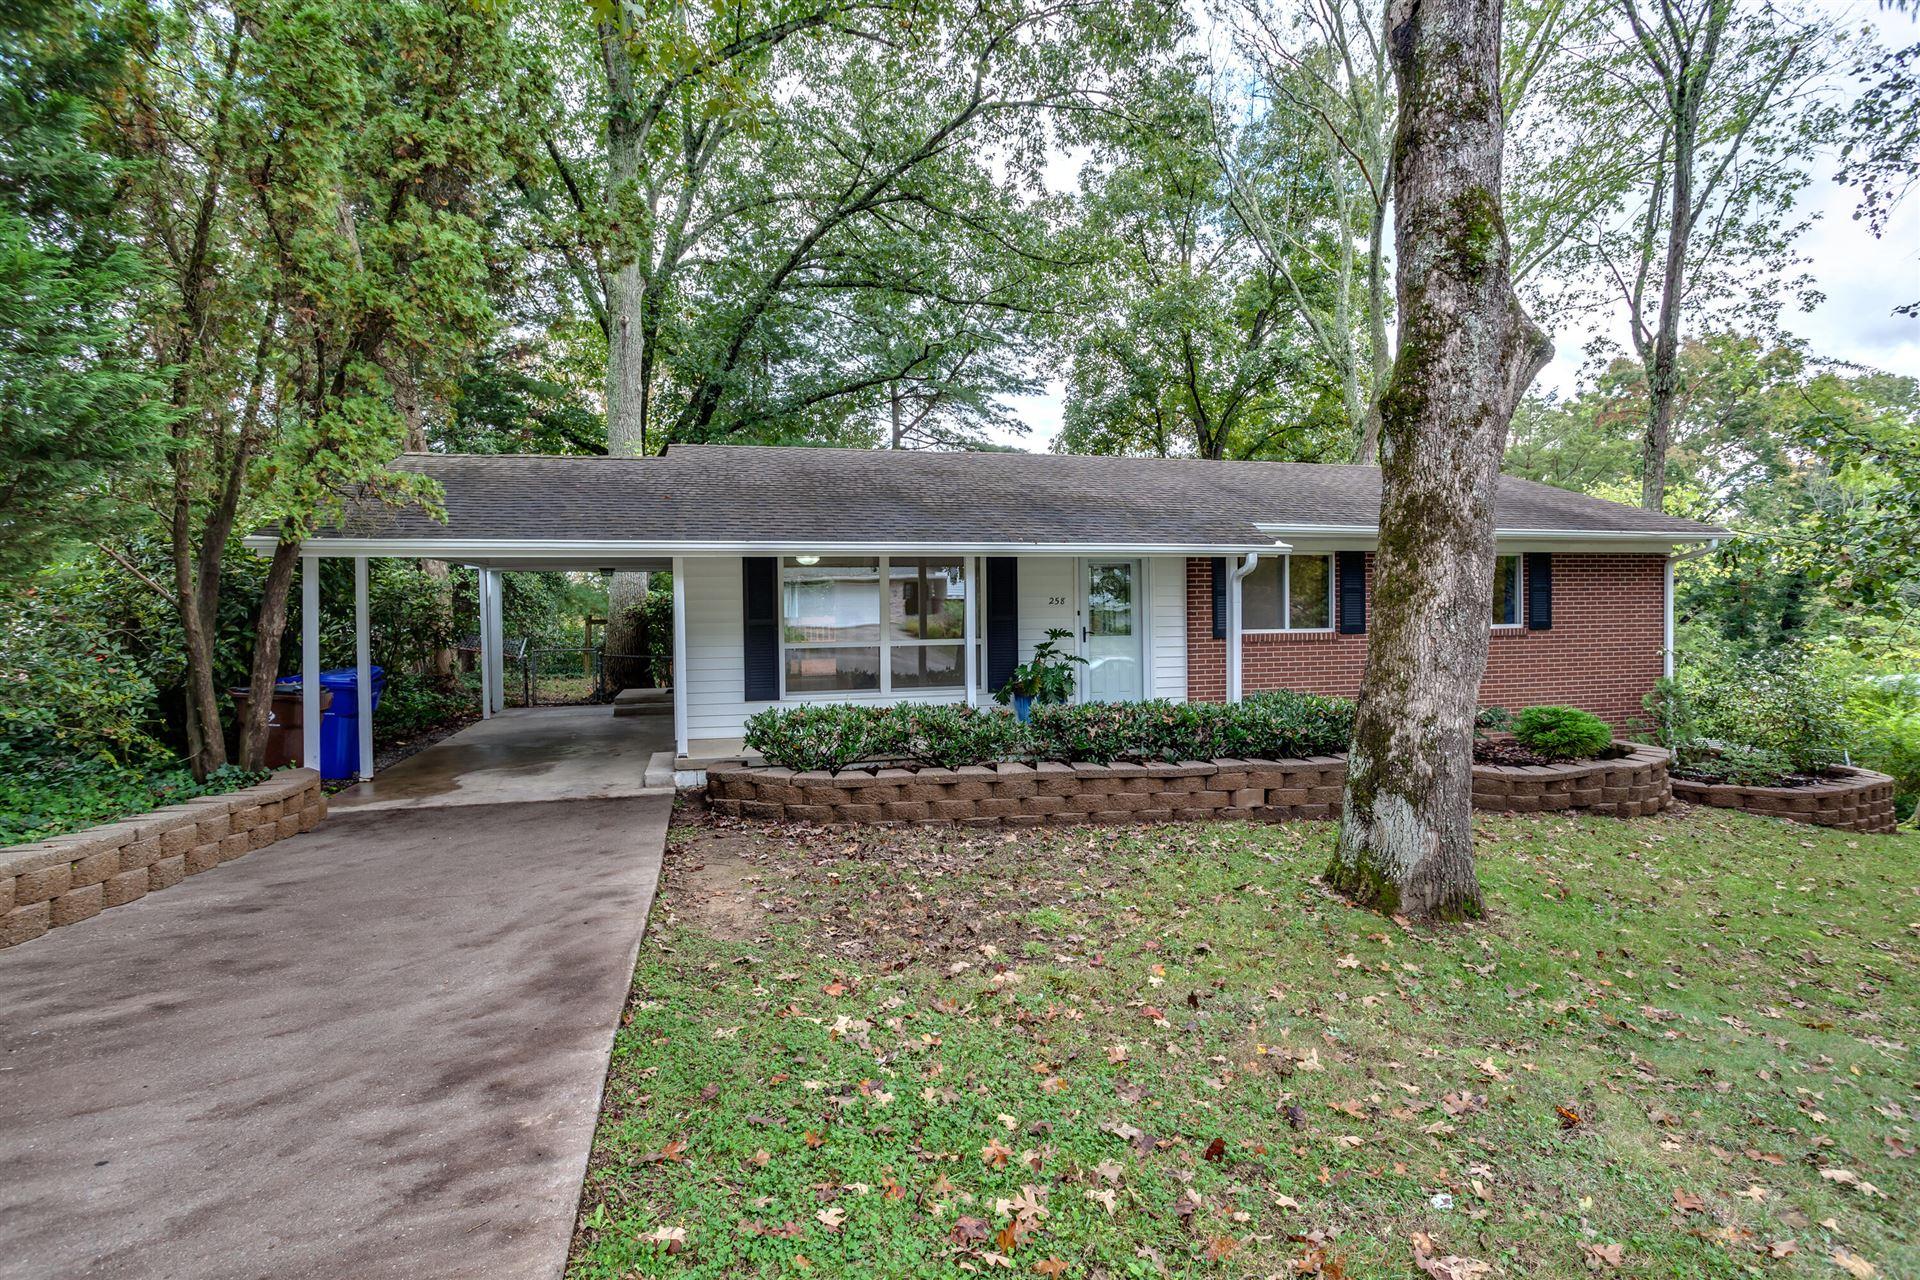 Photo of 258 Iroquois Rd, Oak Ridge, TN 37830 (MLS # 1170190)